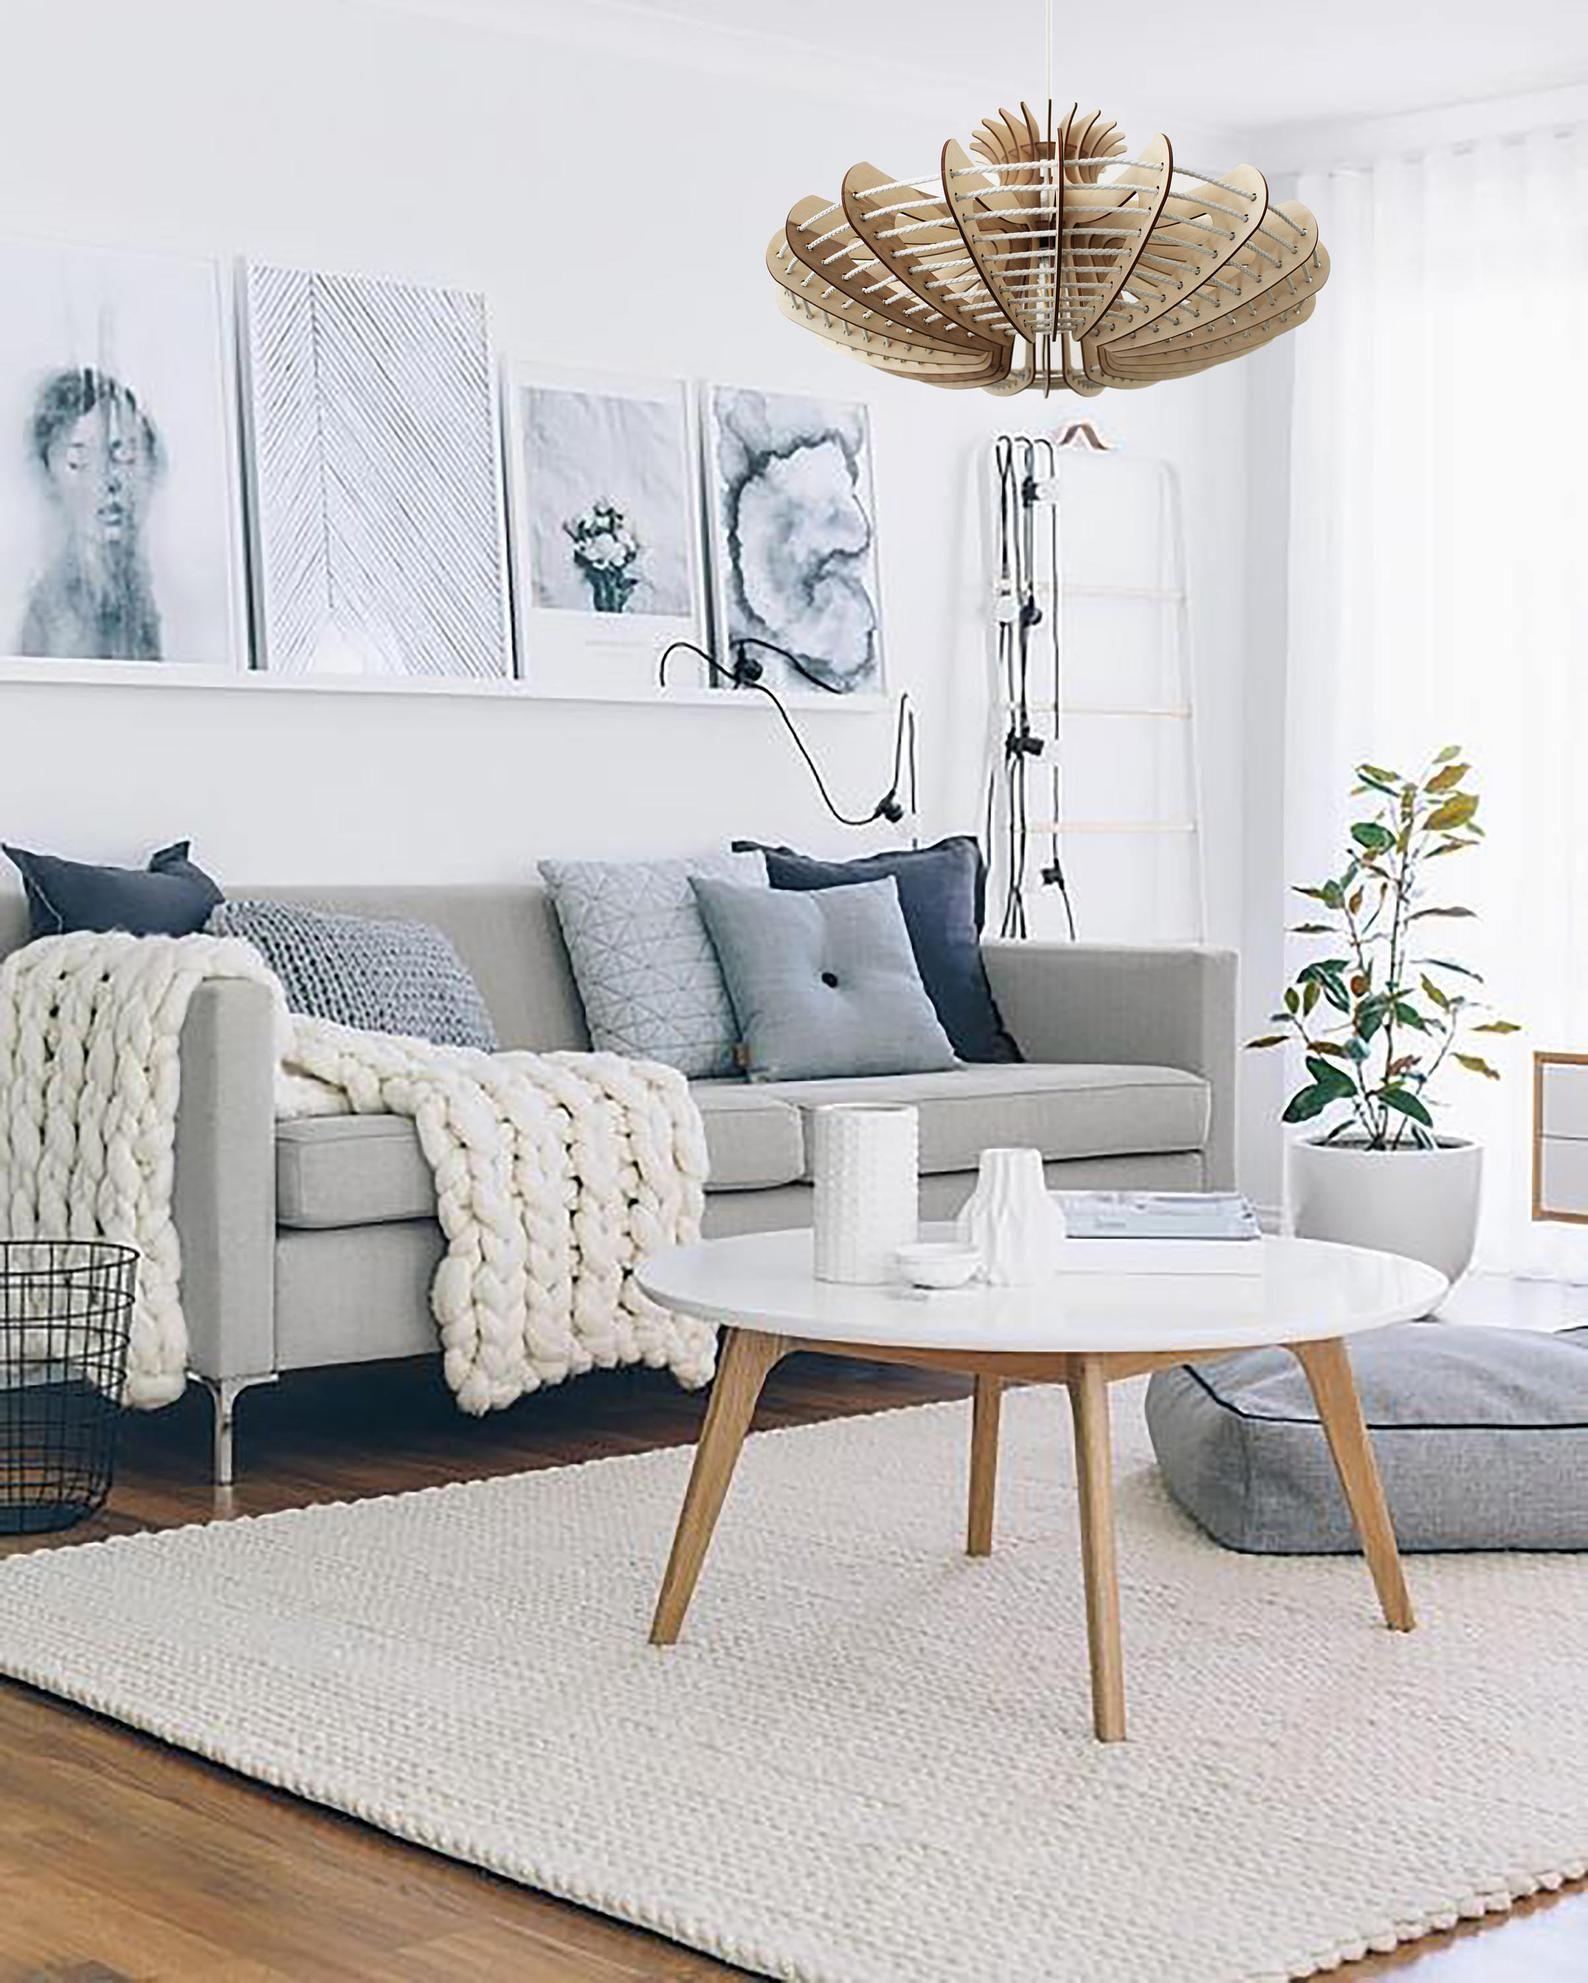 Jellyfish Pendant Light Wood Lamp Ceiling Fixture Dining Etsy In 2020 Grey Sofa Living Room Living Room Grey Living Room Scandinavian